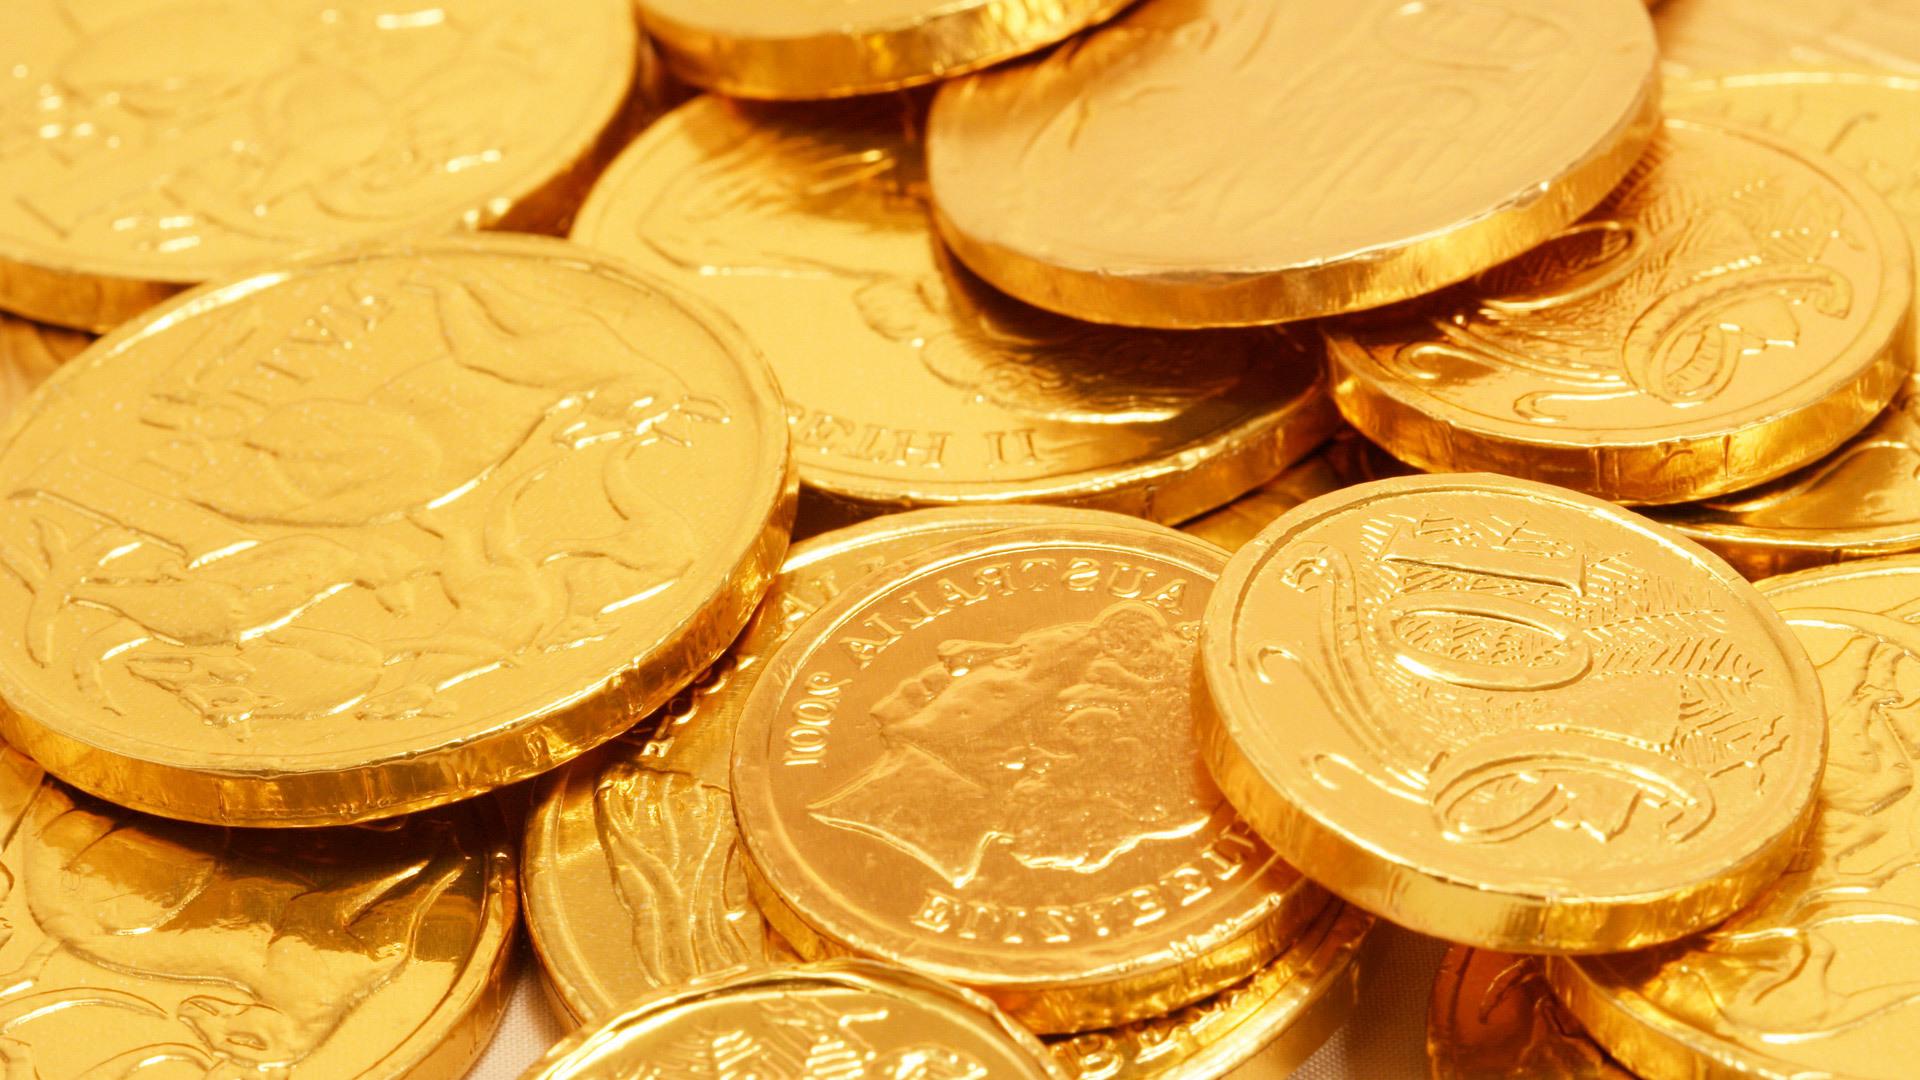 42] Gold Coins Wallpaper on WallpaperSafari 1920x1080